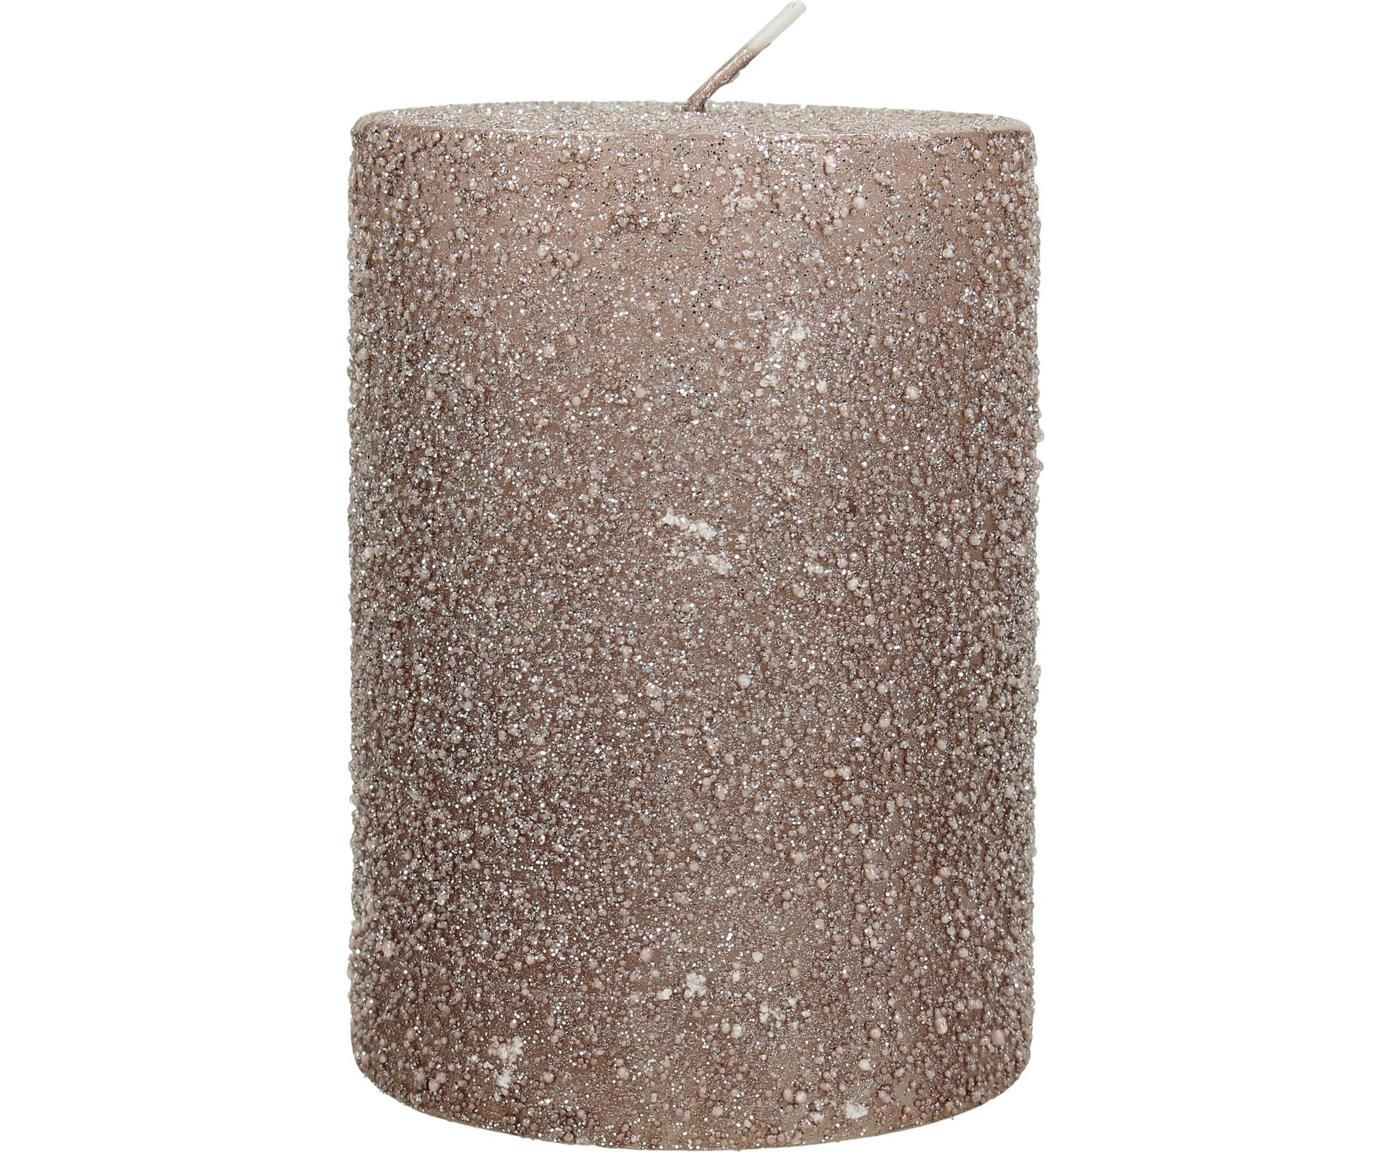 Stumpenkerze Flair, Wachs, Kupferfarben, Ø 7 x H 10 cm